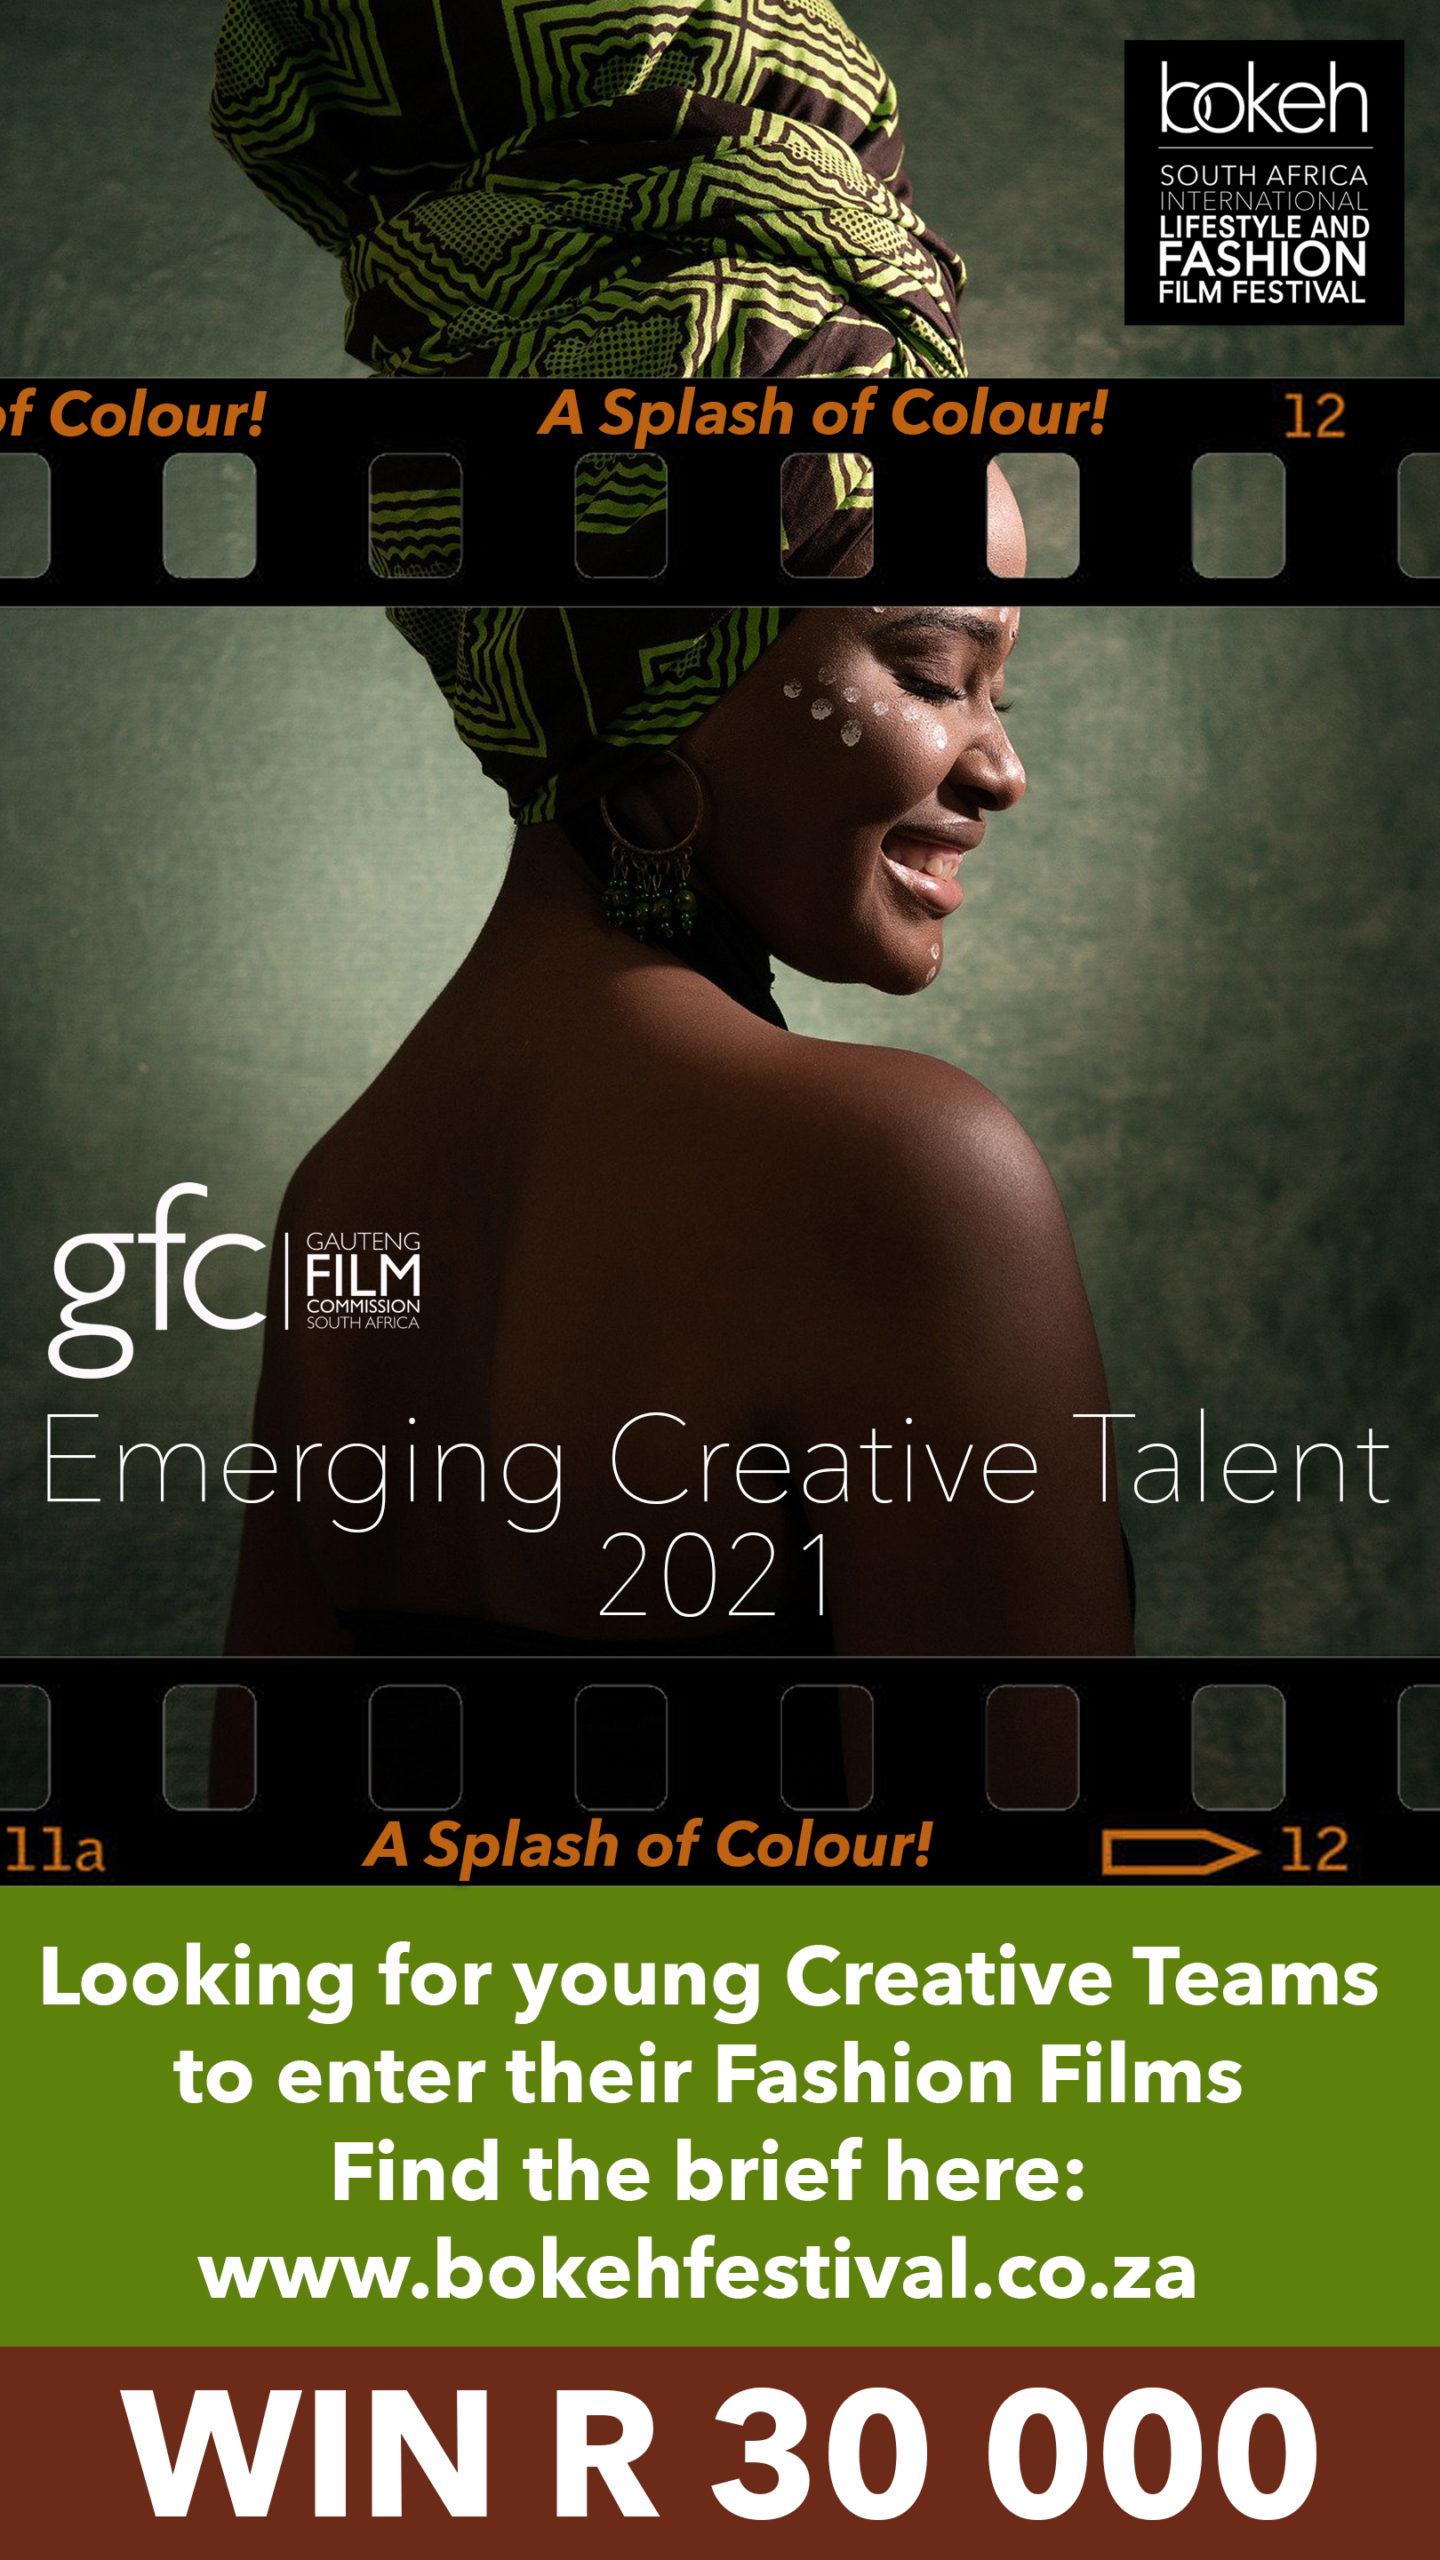 2021 EMERGING CREATIVE TALENT – BRIEF